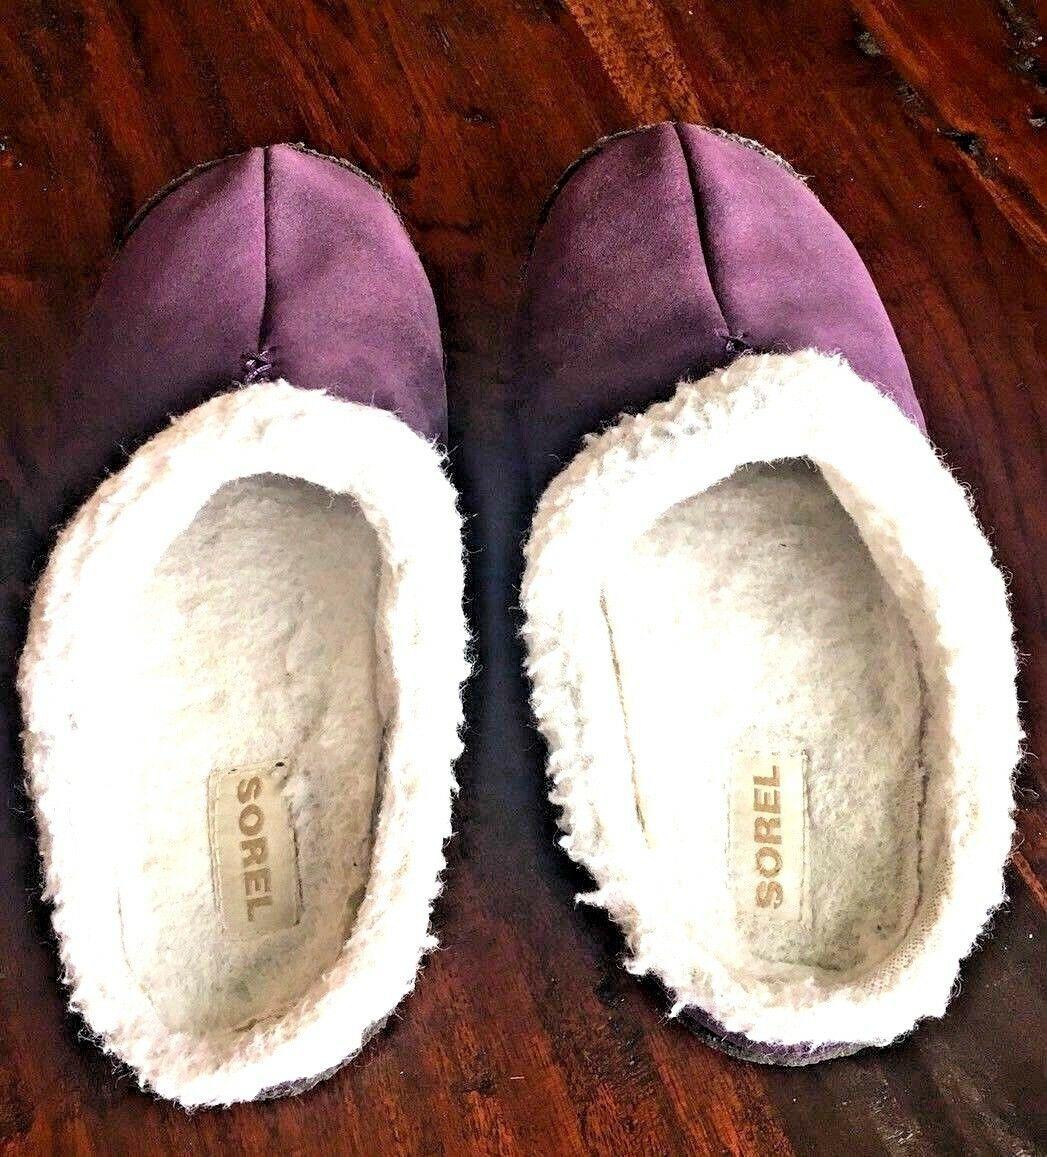 SOREL 9381 Womens Nakiska LILAC Purple Suede Clog Slippers Shoes 6 M #176 image 3